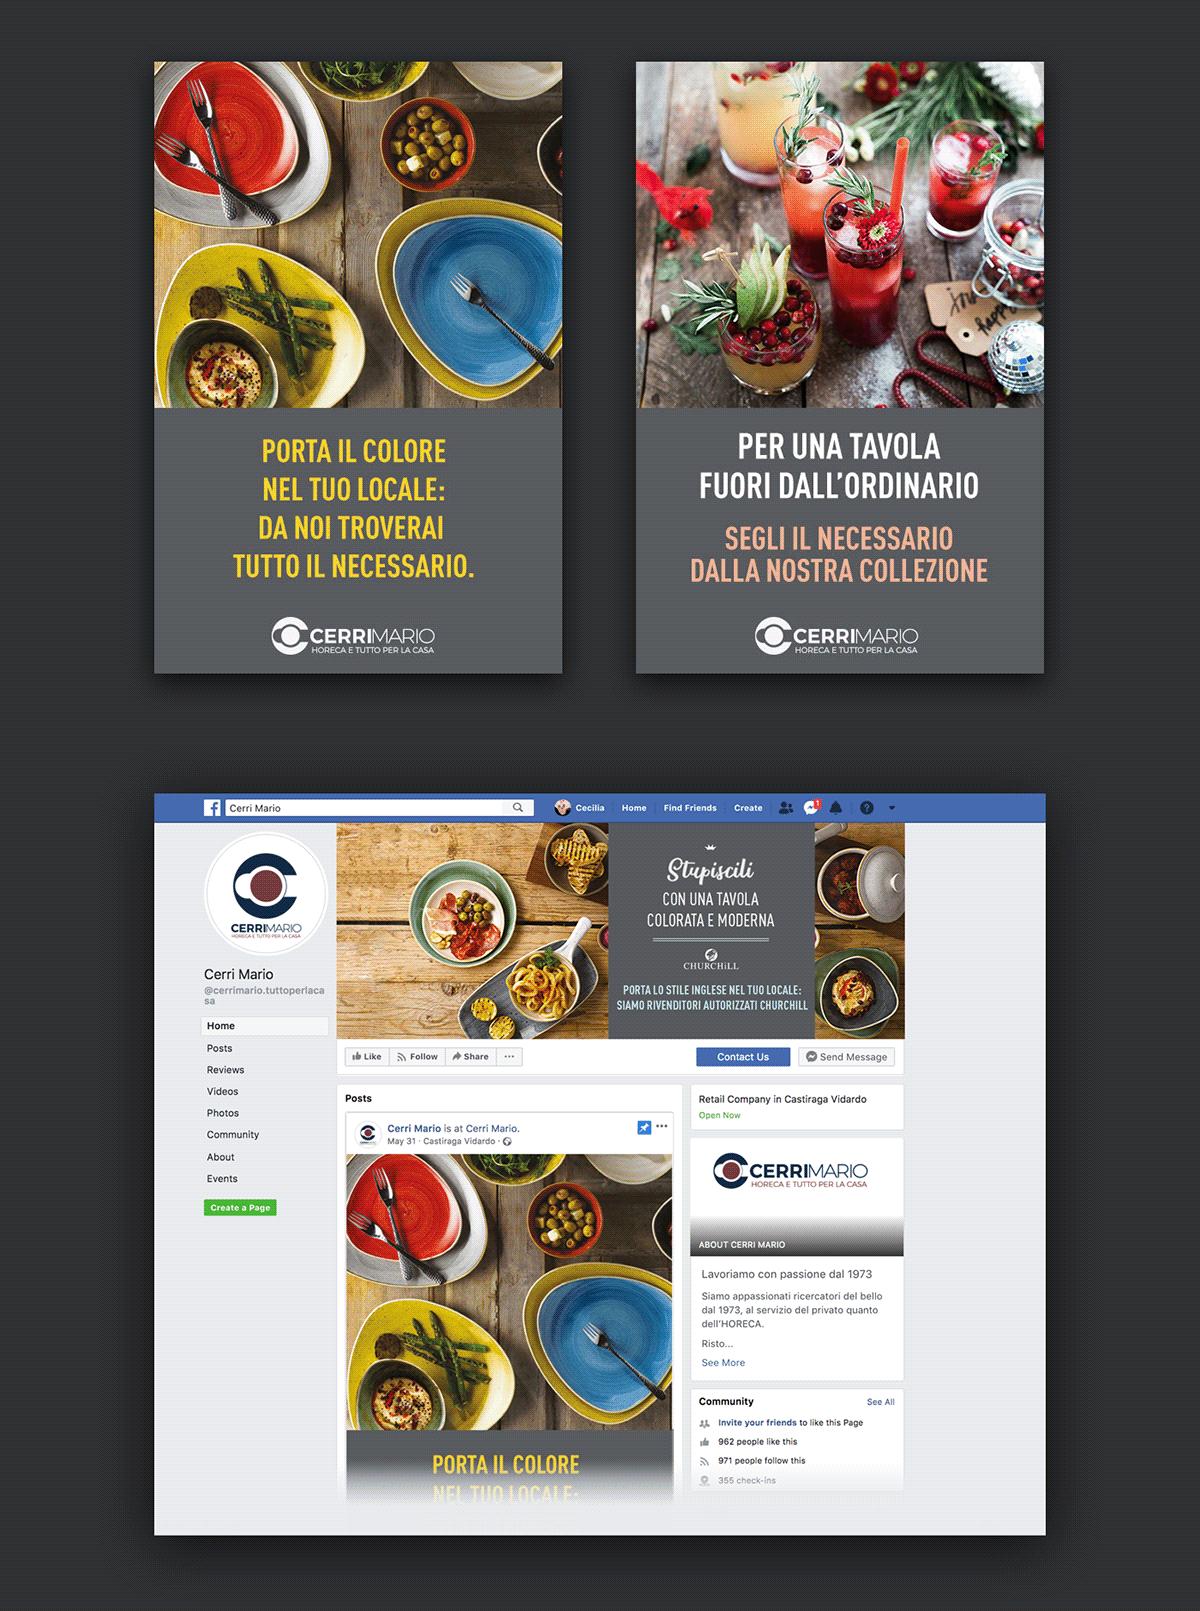 Christmas copyrighting design facebook Halloween household seasoning social social-media-marketing Socialmedia